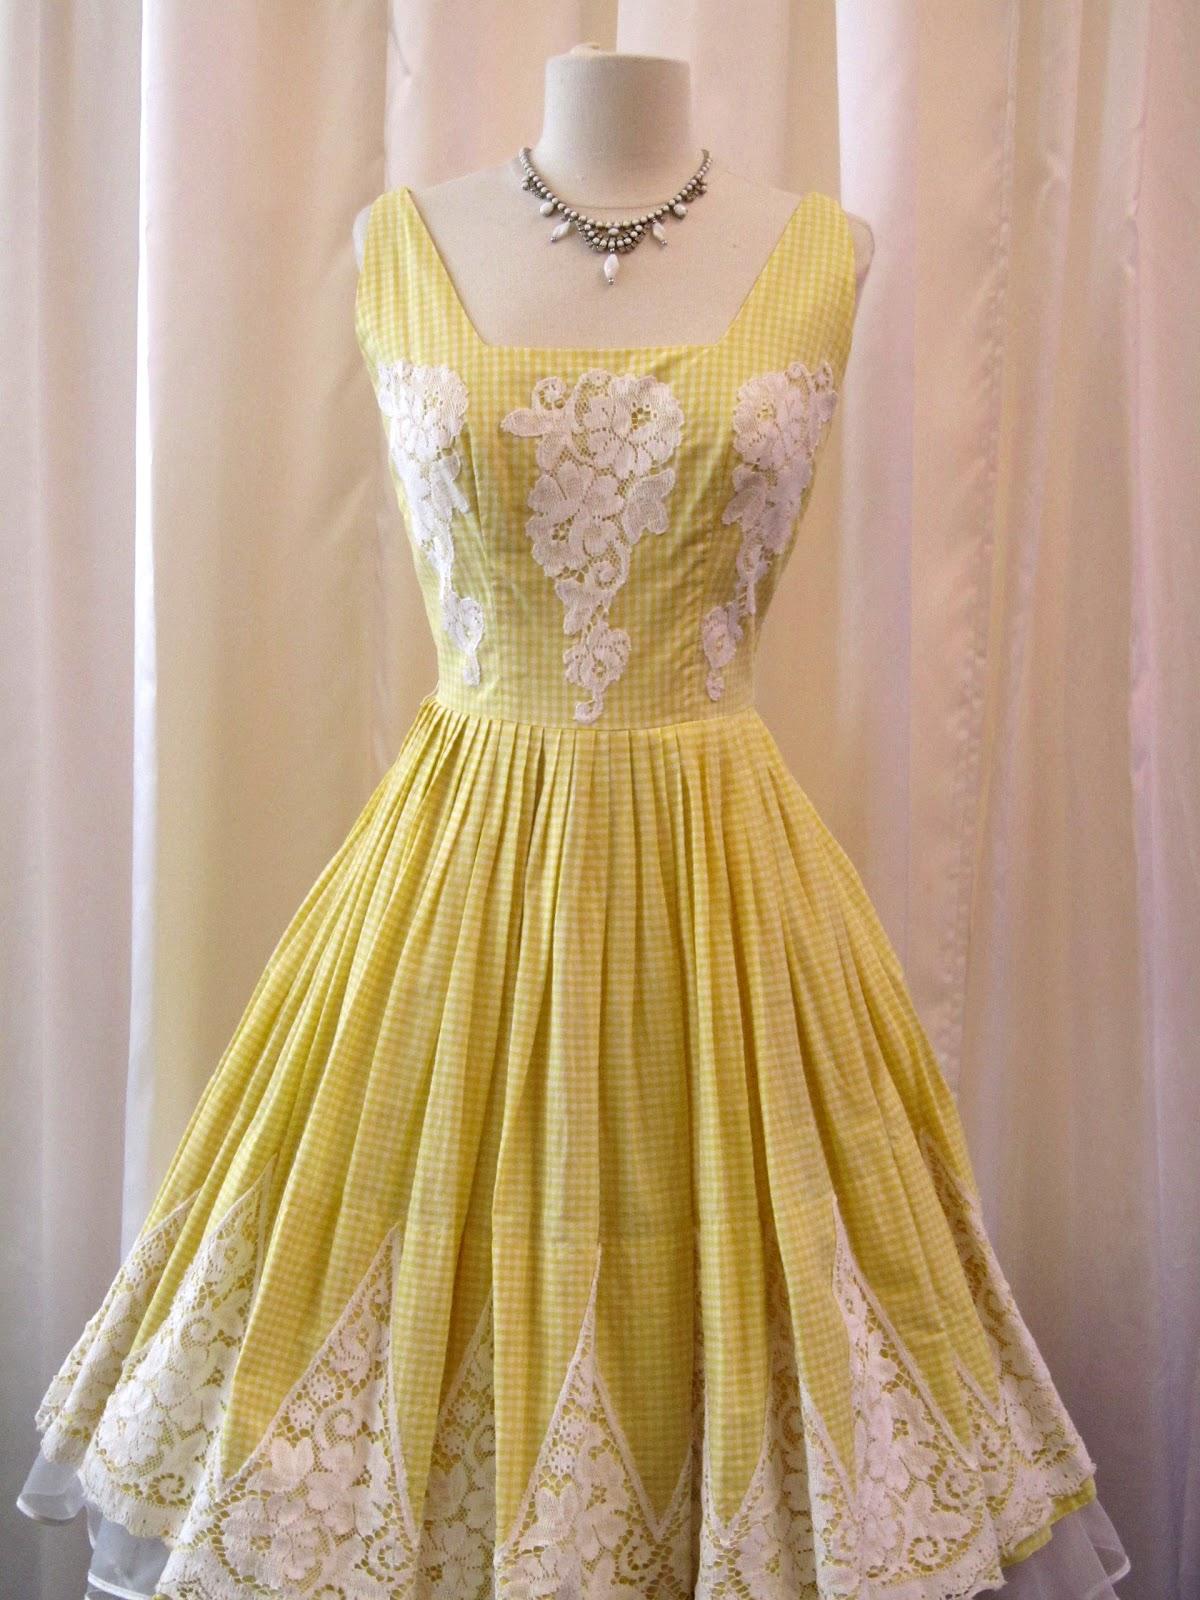 dirty fabulous glamorous vintage cocktail dressesooh